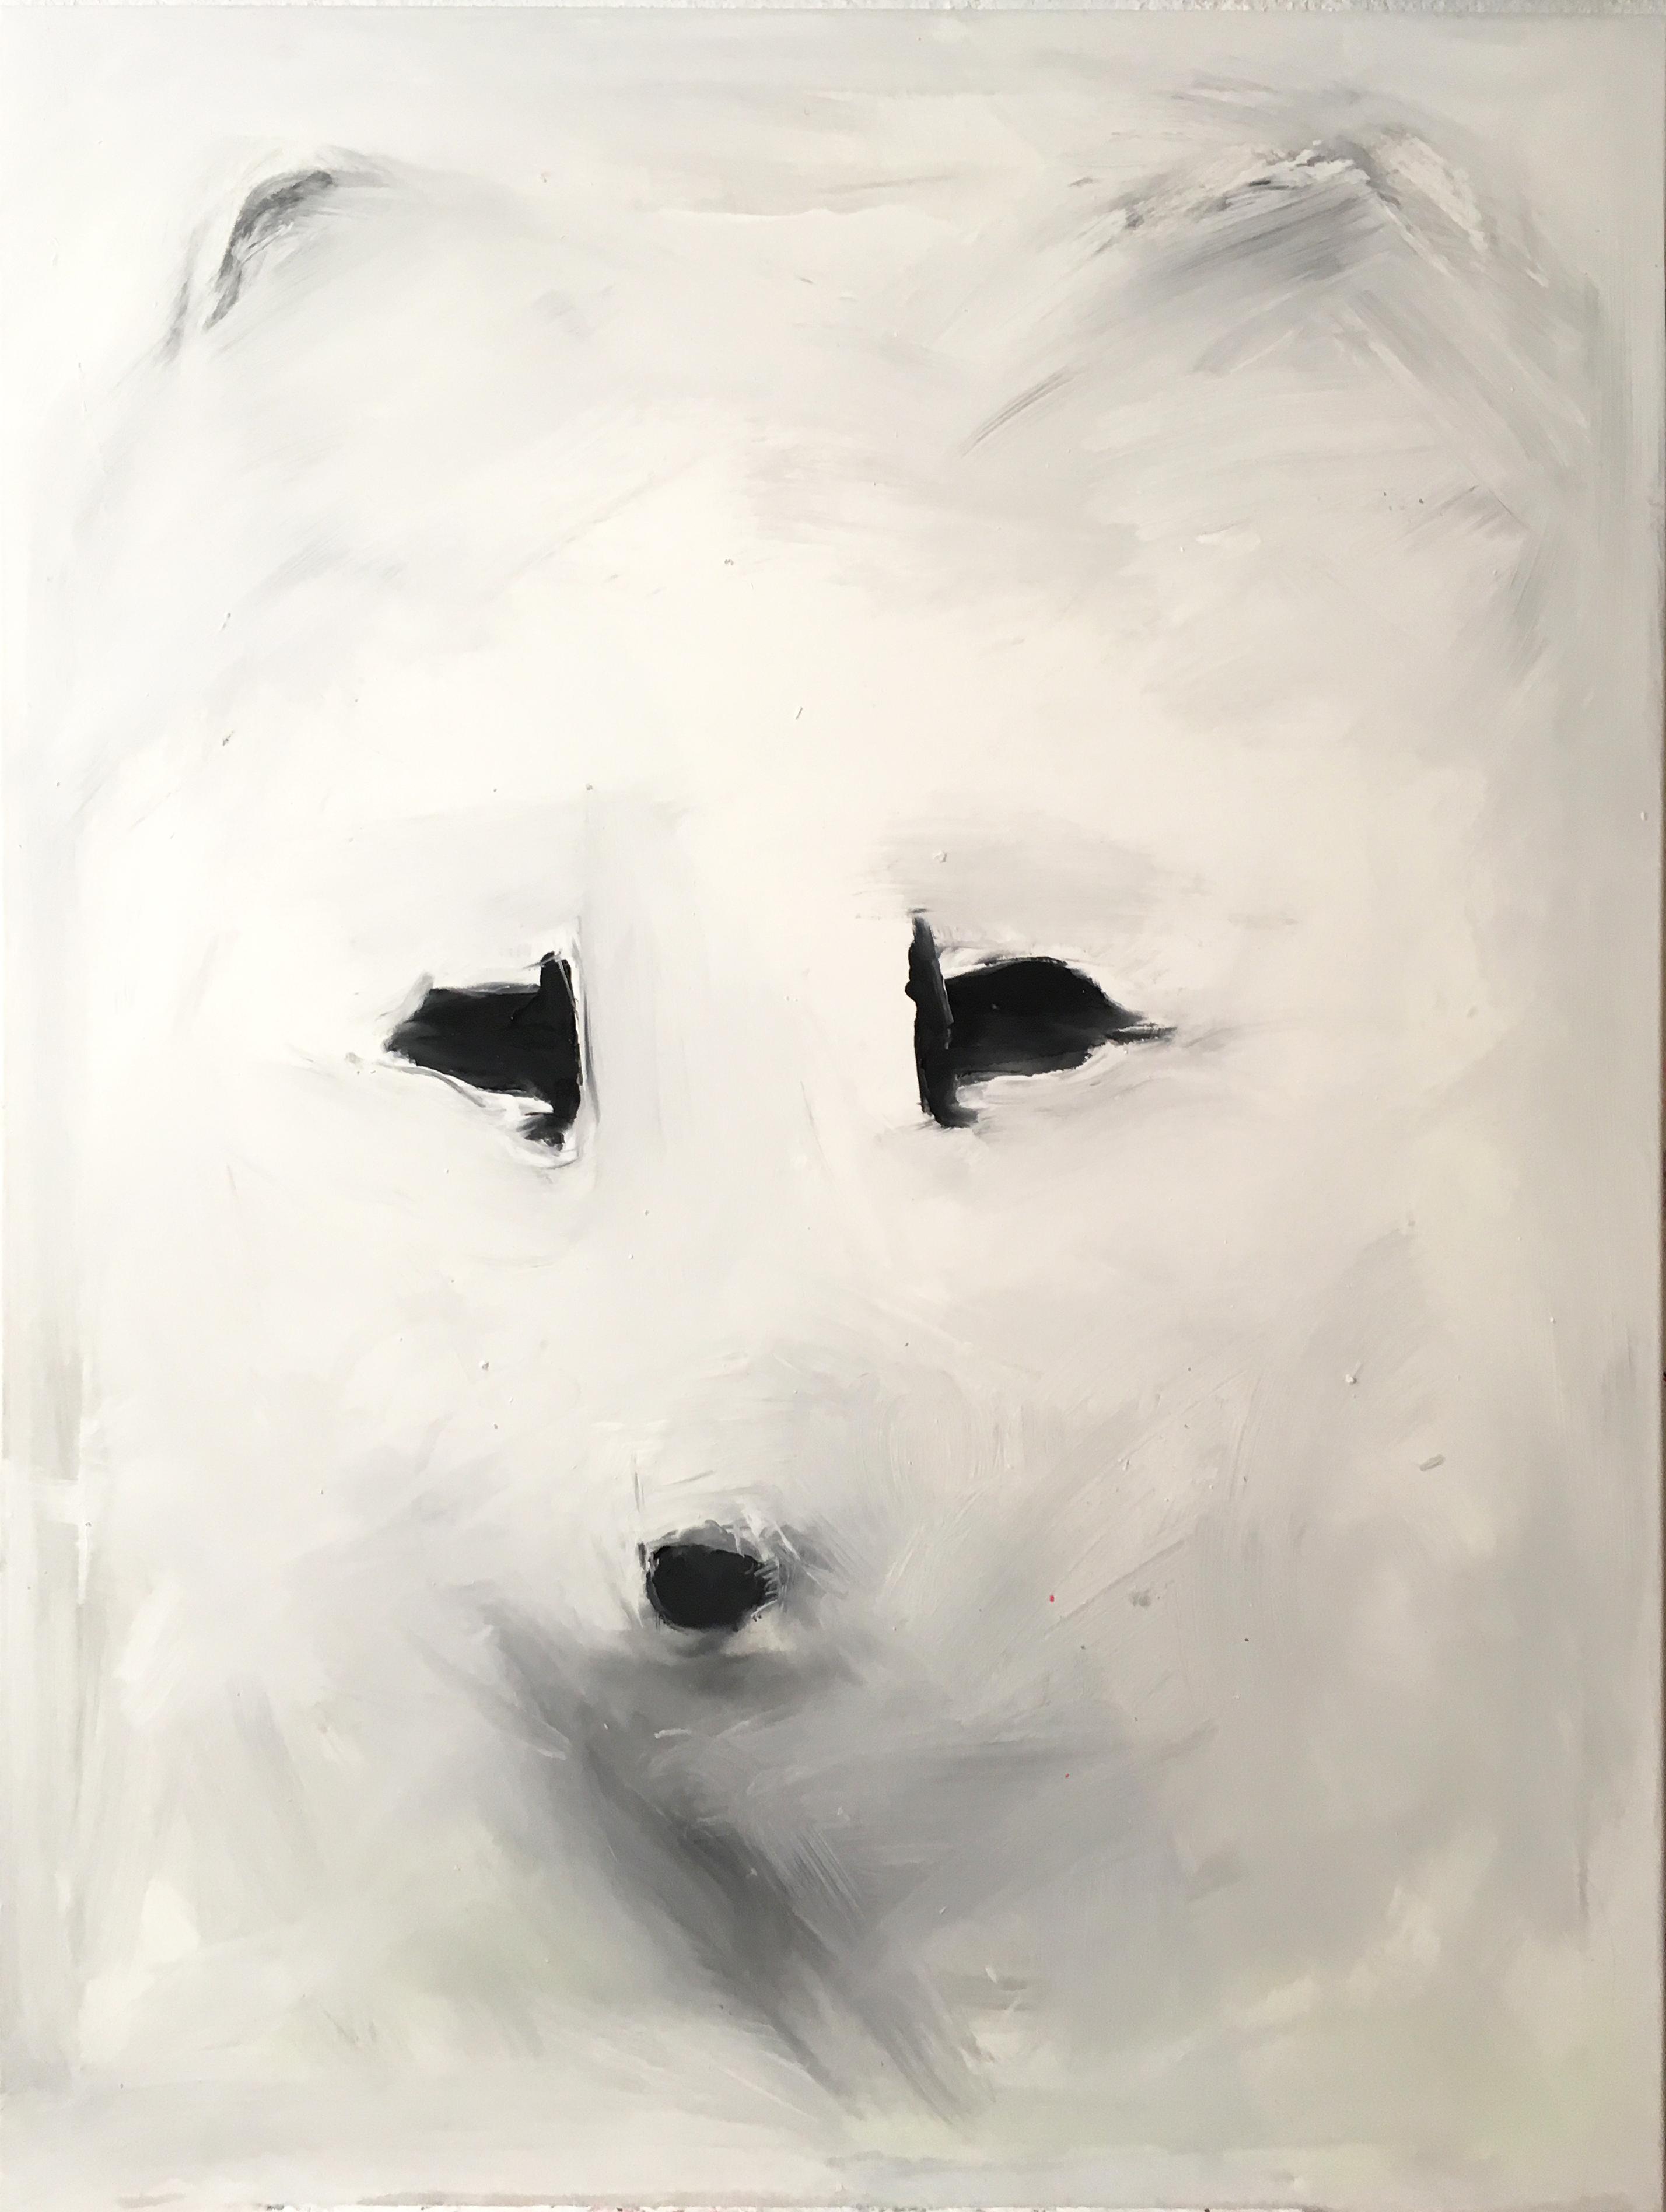 Foxi Snow